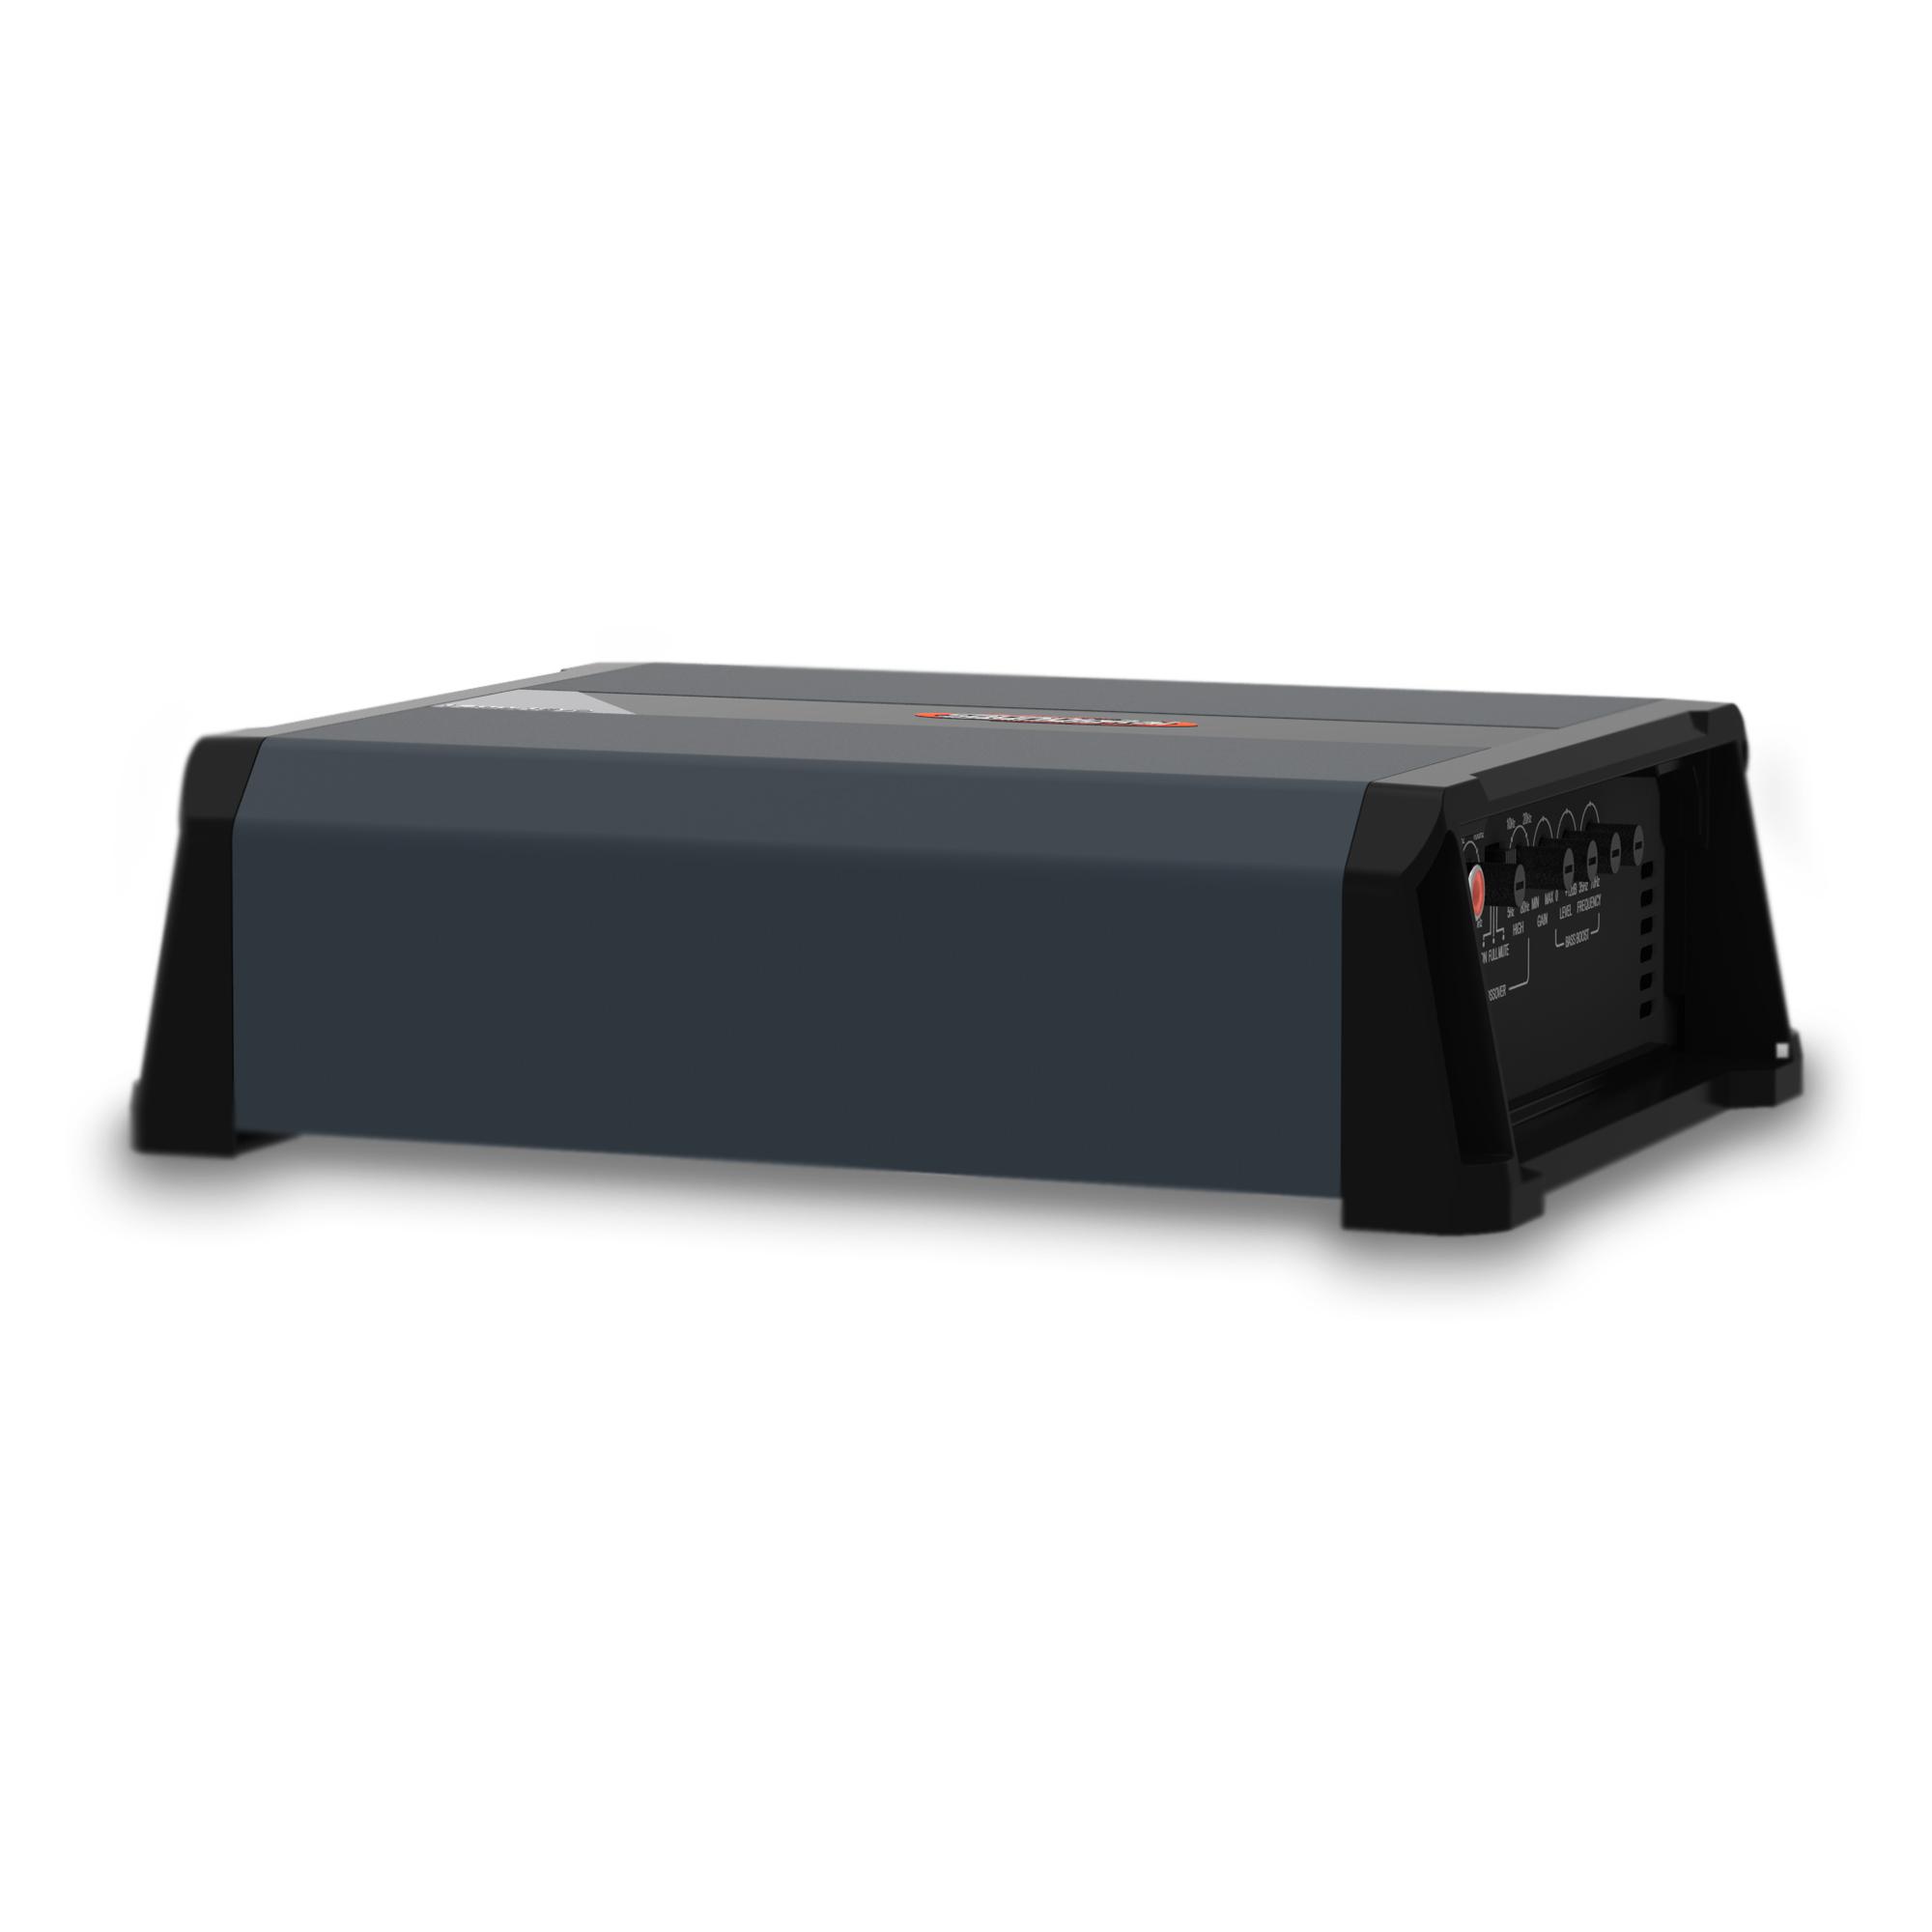 Soundigital SD1600.1 EVO 4.0 2Ohm amplificador mono - 1600W